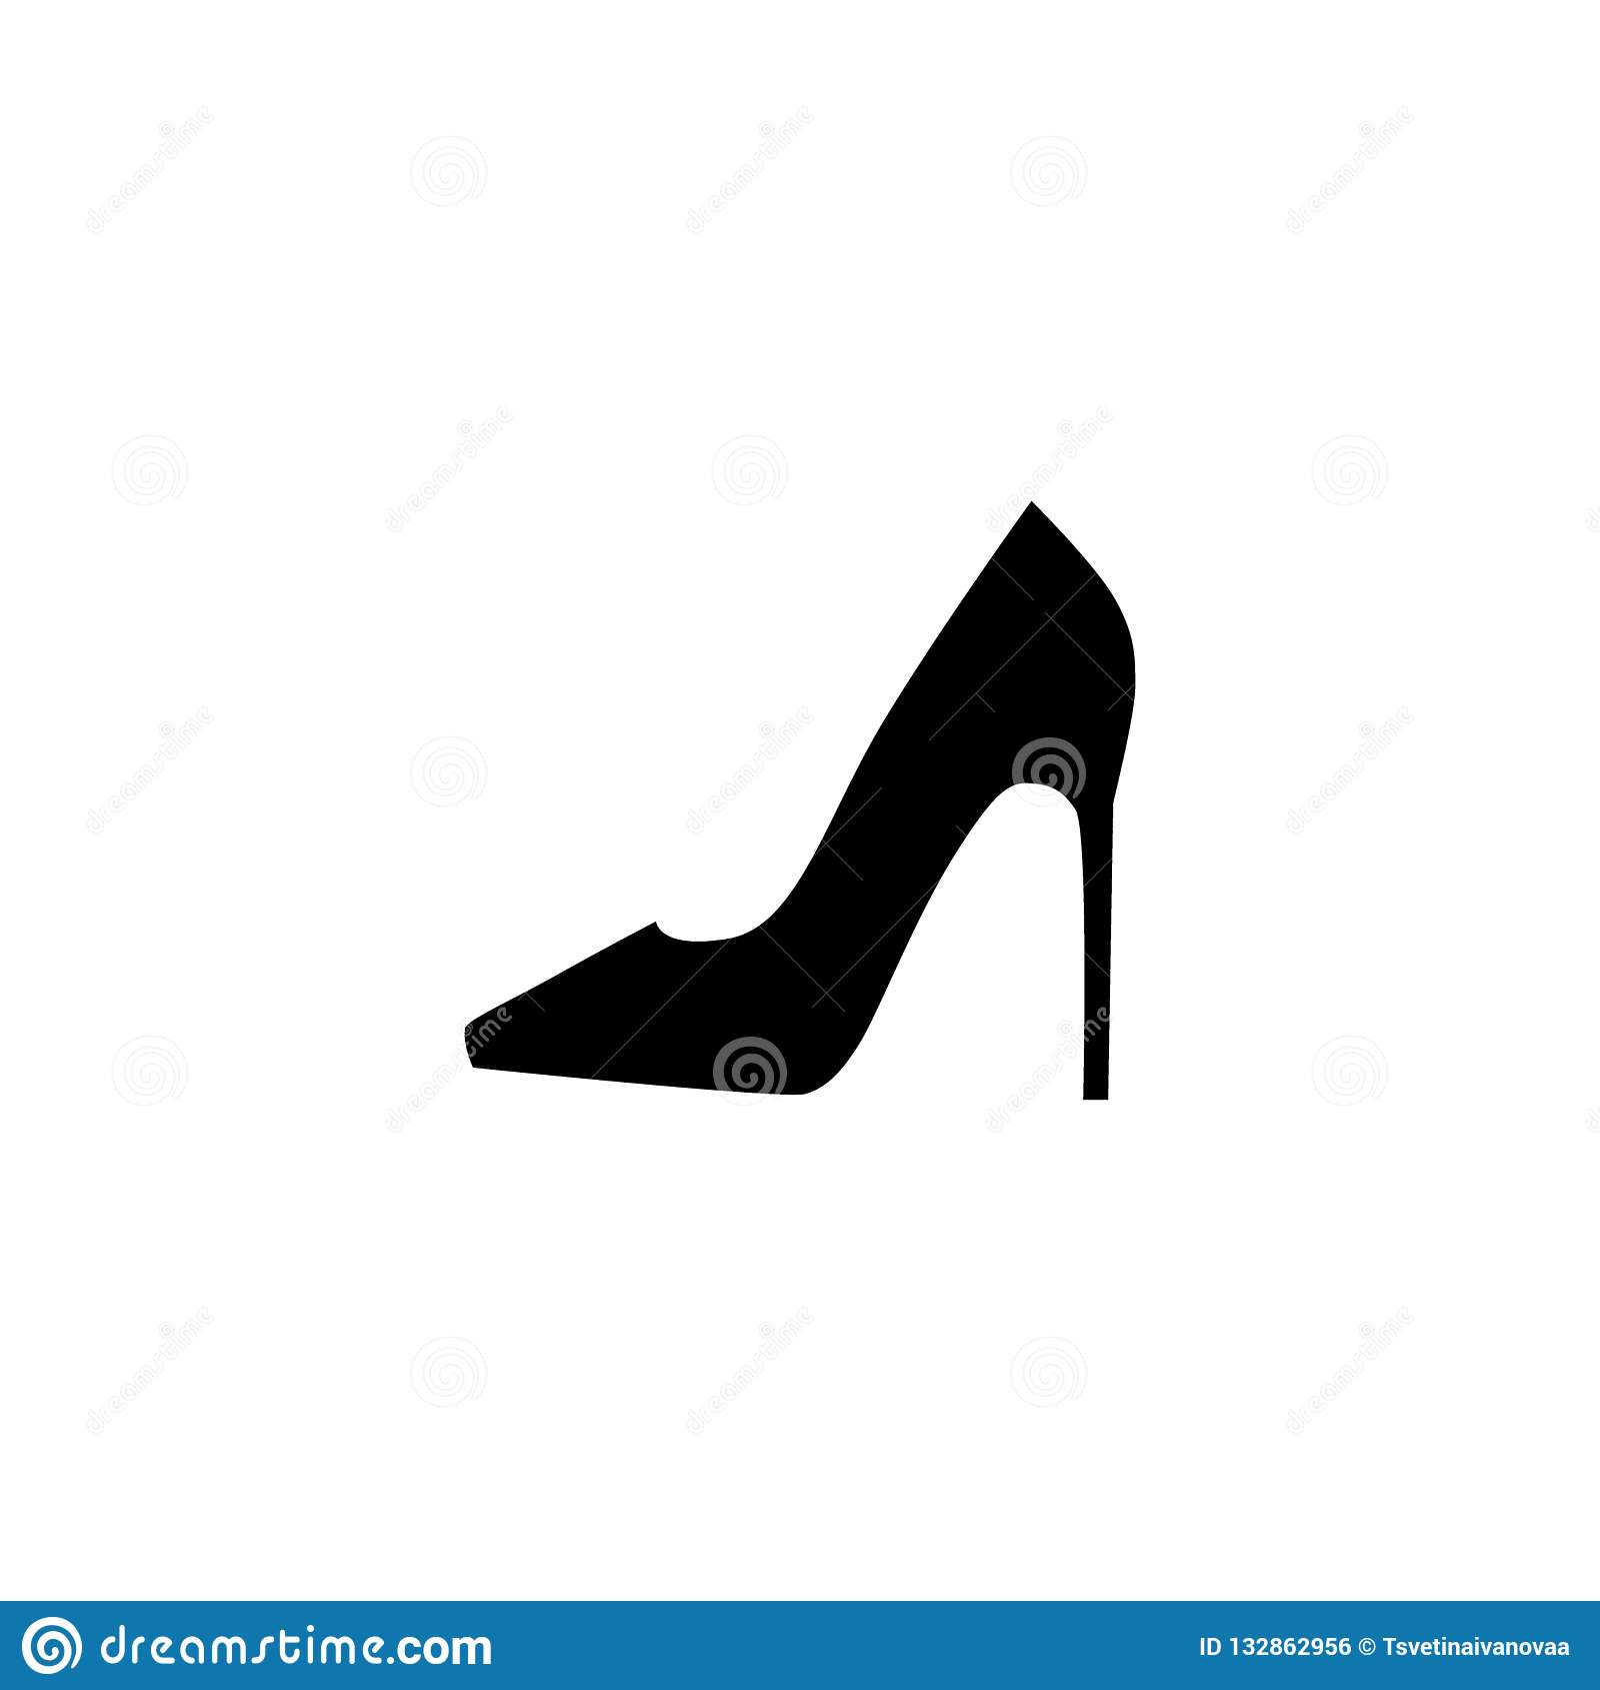 Del Alto Zapato Femenino Vector Simple Silueta Tacón wHRgFzq